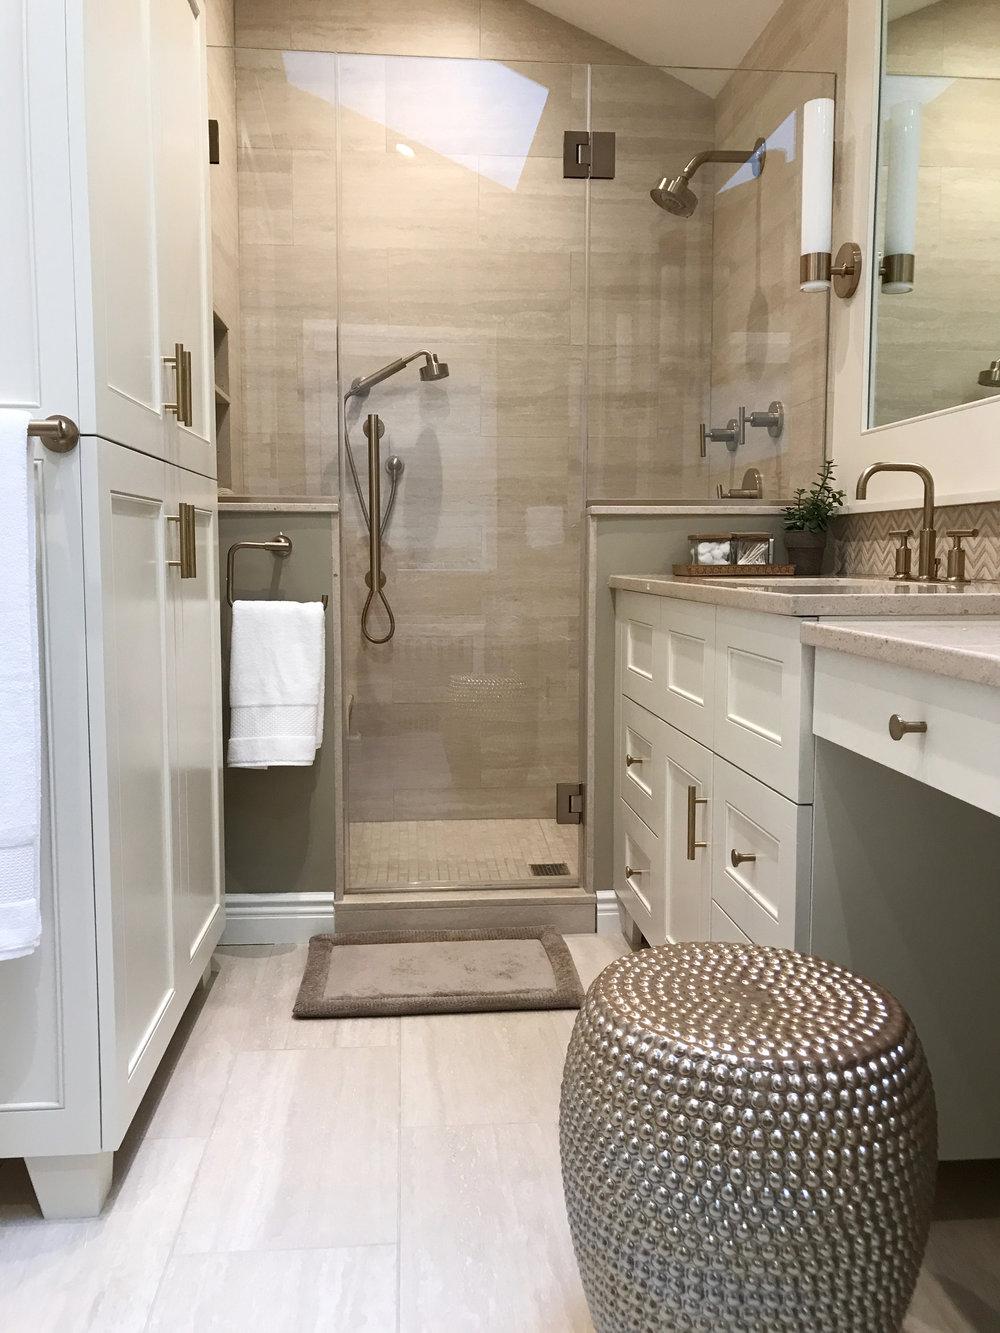 KAM Design_MasterBath_Shower_GlassEnclosure_LinenCloset_Stool_Pleasantville_2017.jpg